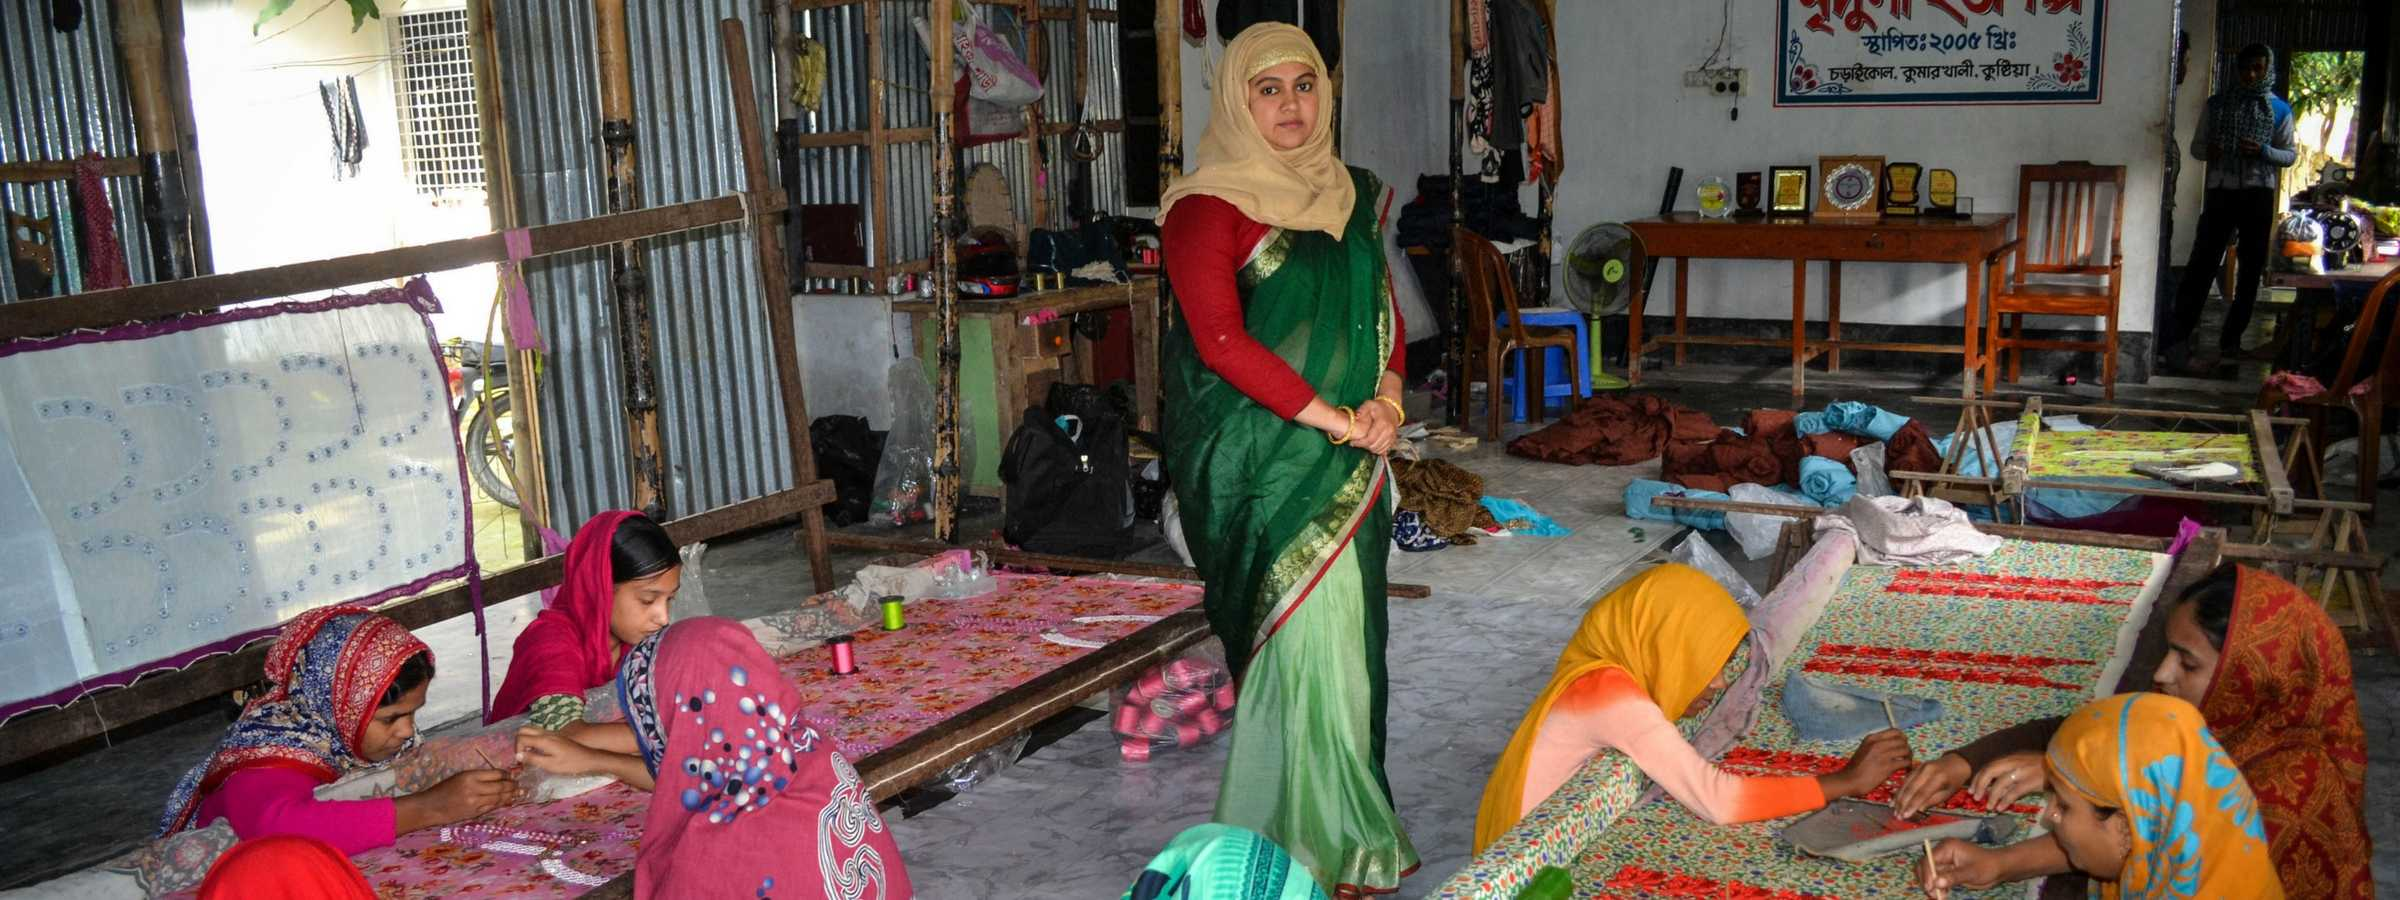 women entrepreneurship in bangladesh essay Women sme entrepreneurs in ensuring women empowerment in bangladesh: a study on women sme entrepreneurs in bangladesh fatema.